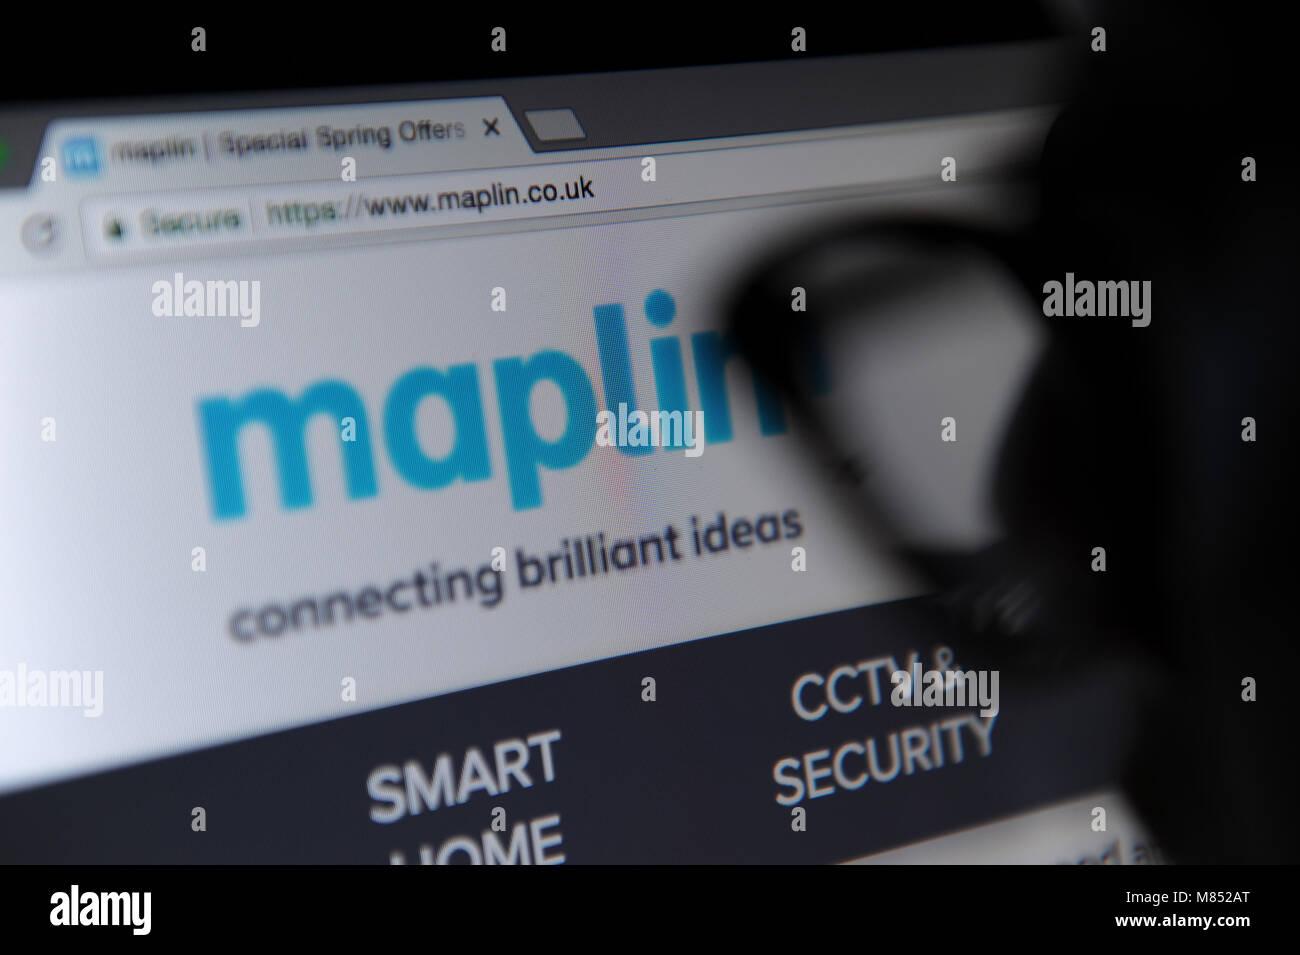 The Maplin website maplin.co.uk on a computer screen - Stock Image